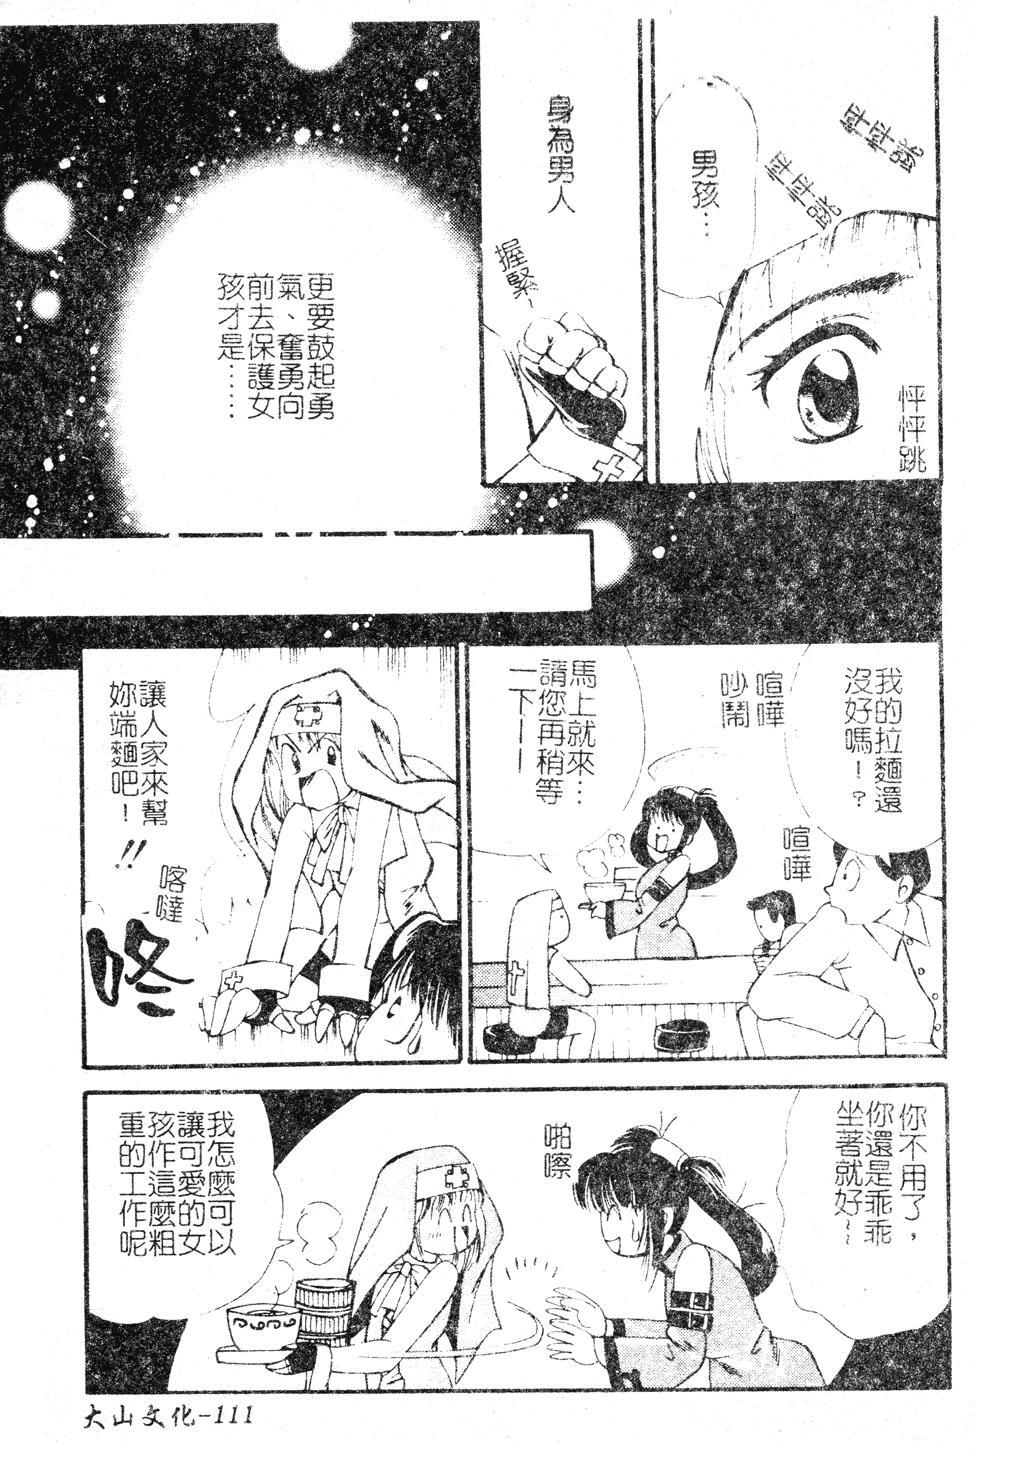 DenNow Koihime Collection 7 109